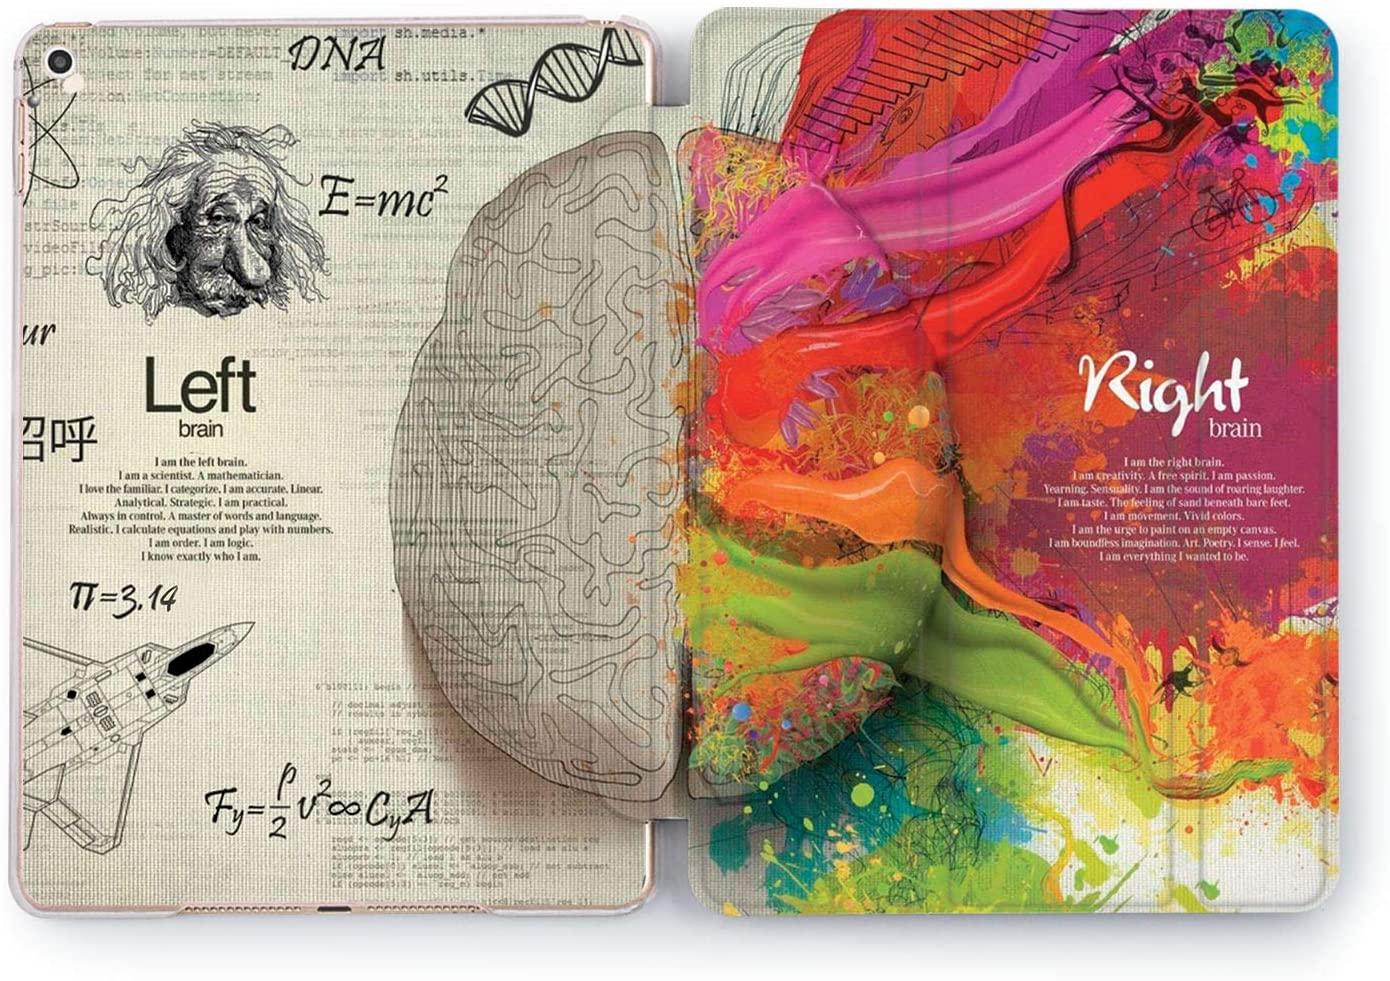 Wonder Wild Brain Hemisphere Apple iPad Pro Case 9.7 11 inch Mini 1 2 3 4 Air 2 10.5 12.9 11 10.2 Design 5th 6th Gen Clear Smart Hard Cover Dualism Mathematical Creativity Scientist Artist Bright